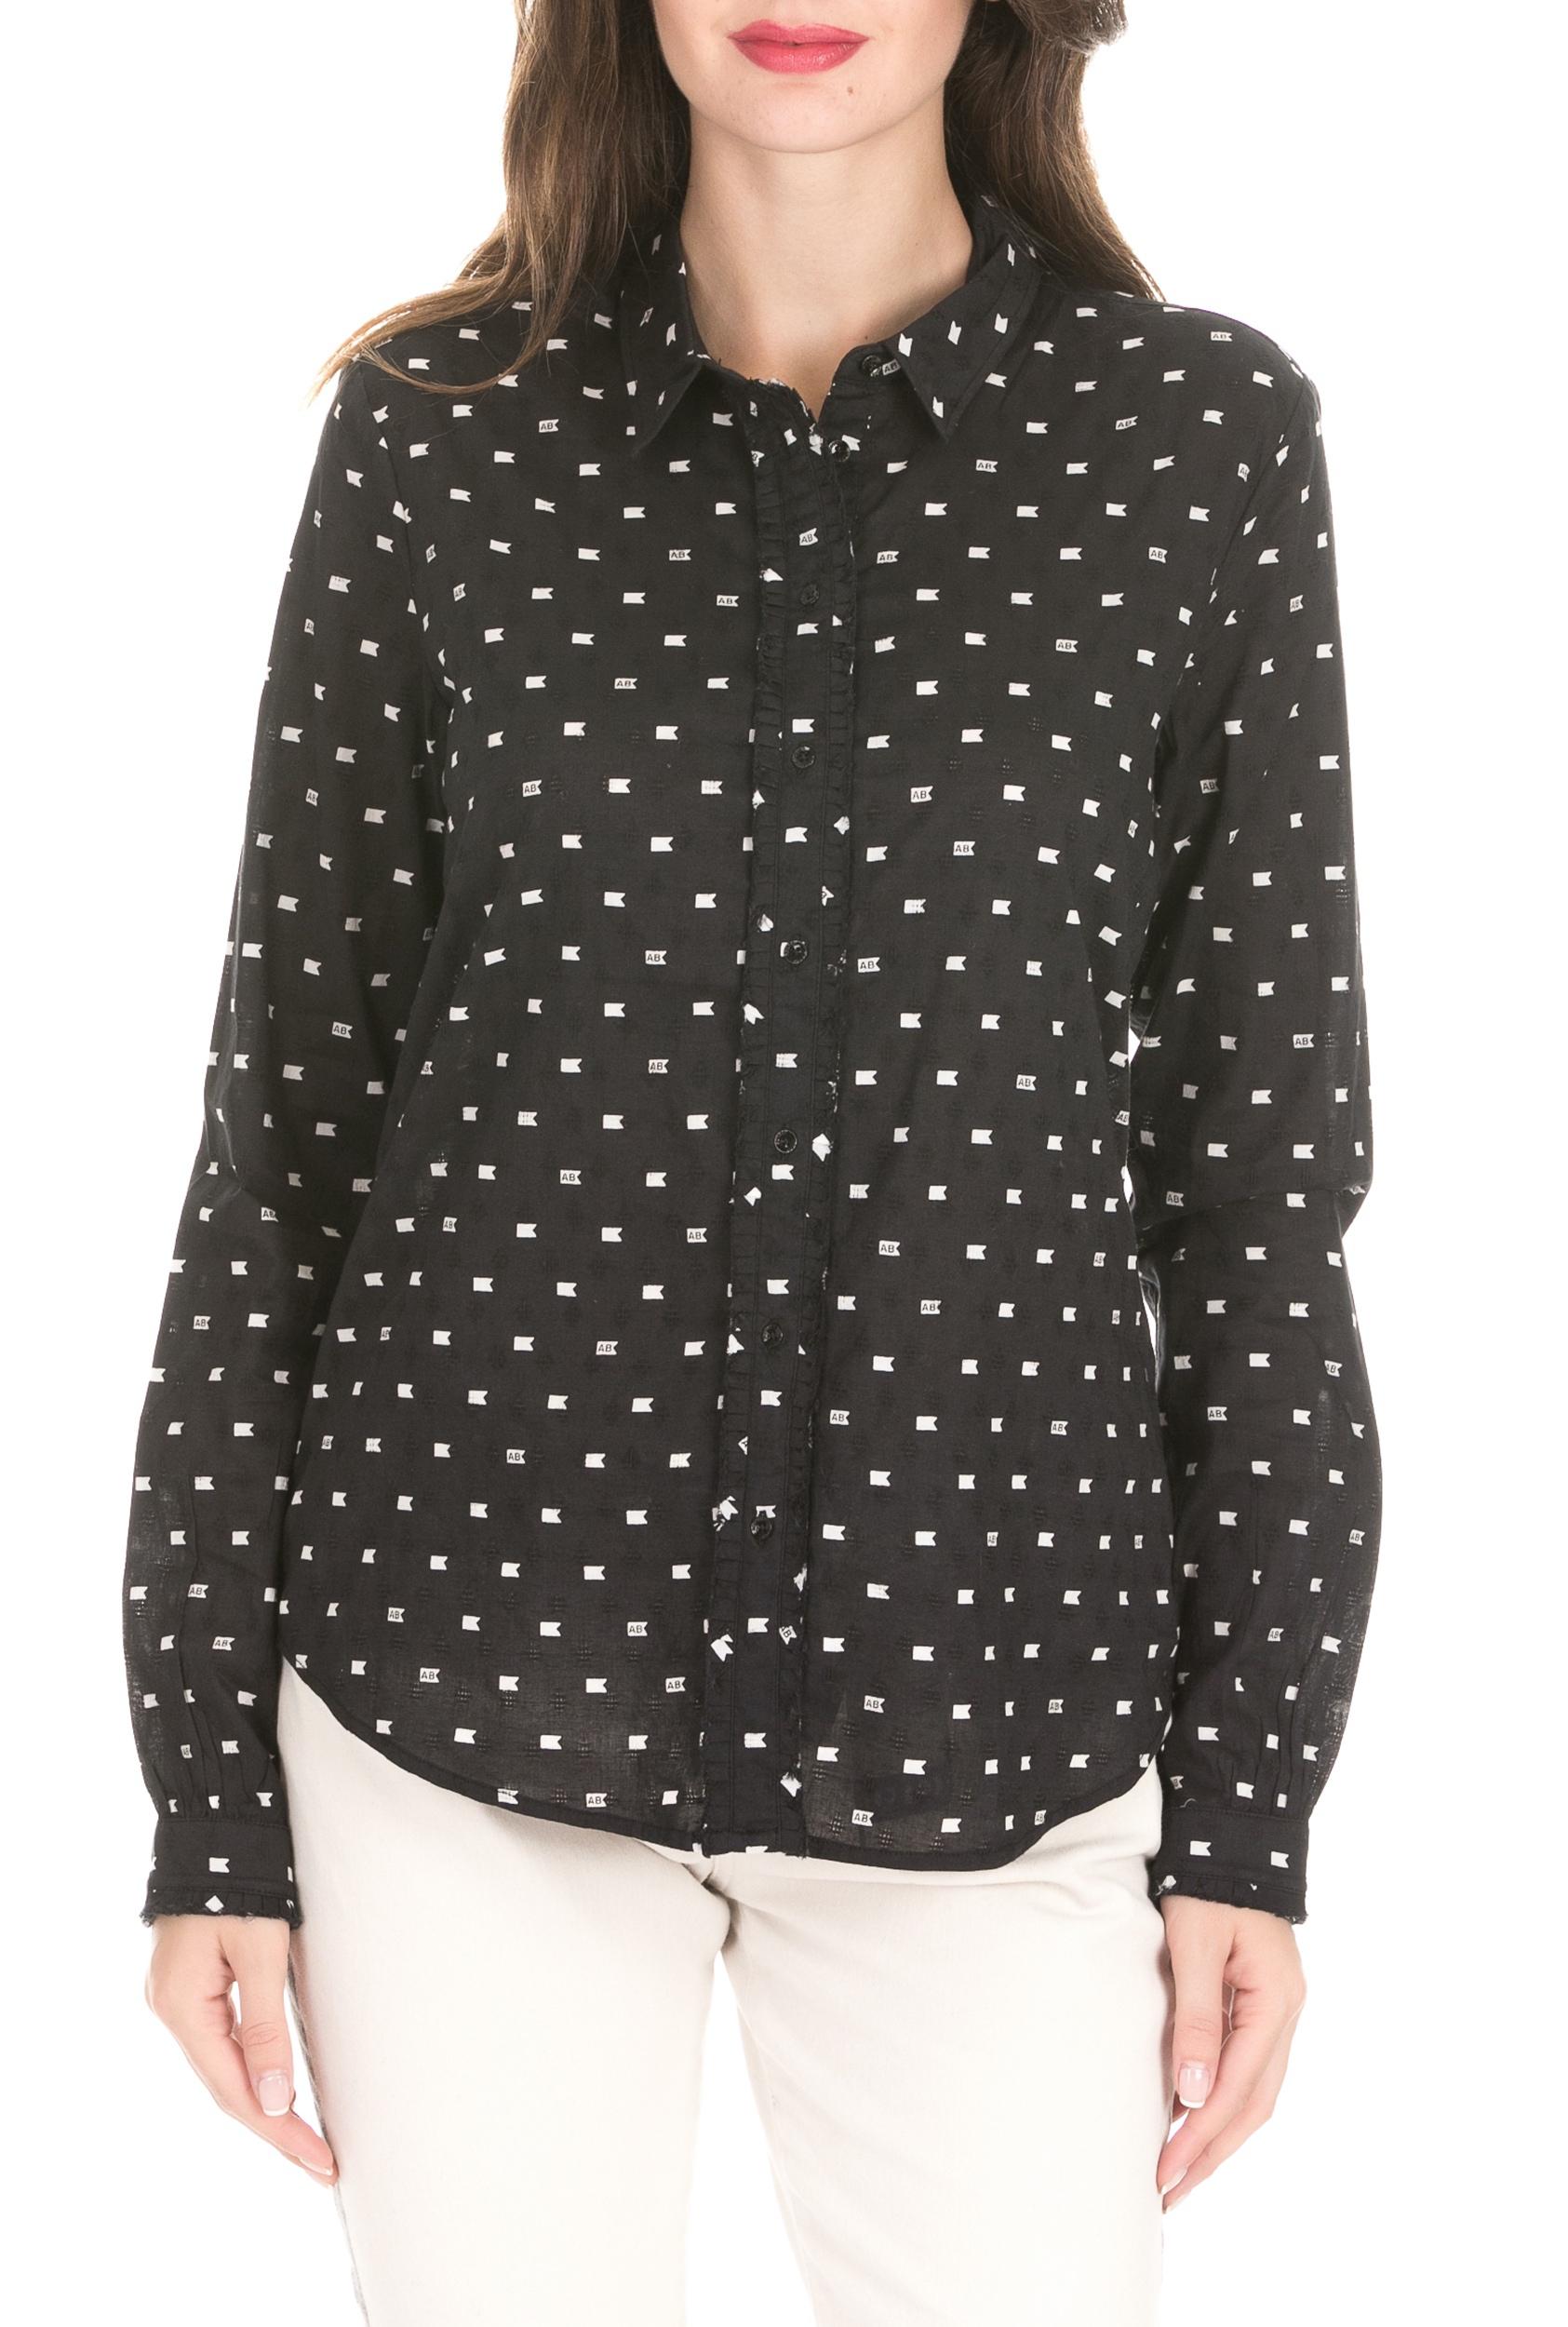 SCOTCH & SODA - Γυναικείο πουκάμισο SCOTCH & SODA μαύρο γυναικεία ρούχα πουκάμισα μακρυμάνικα